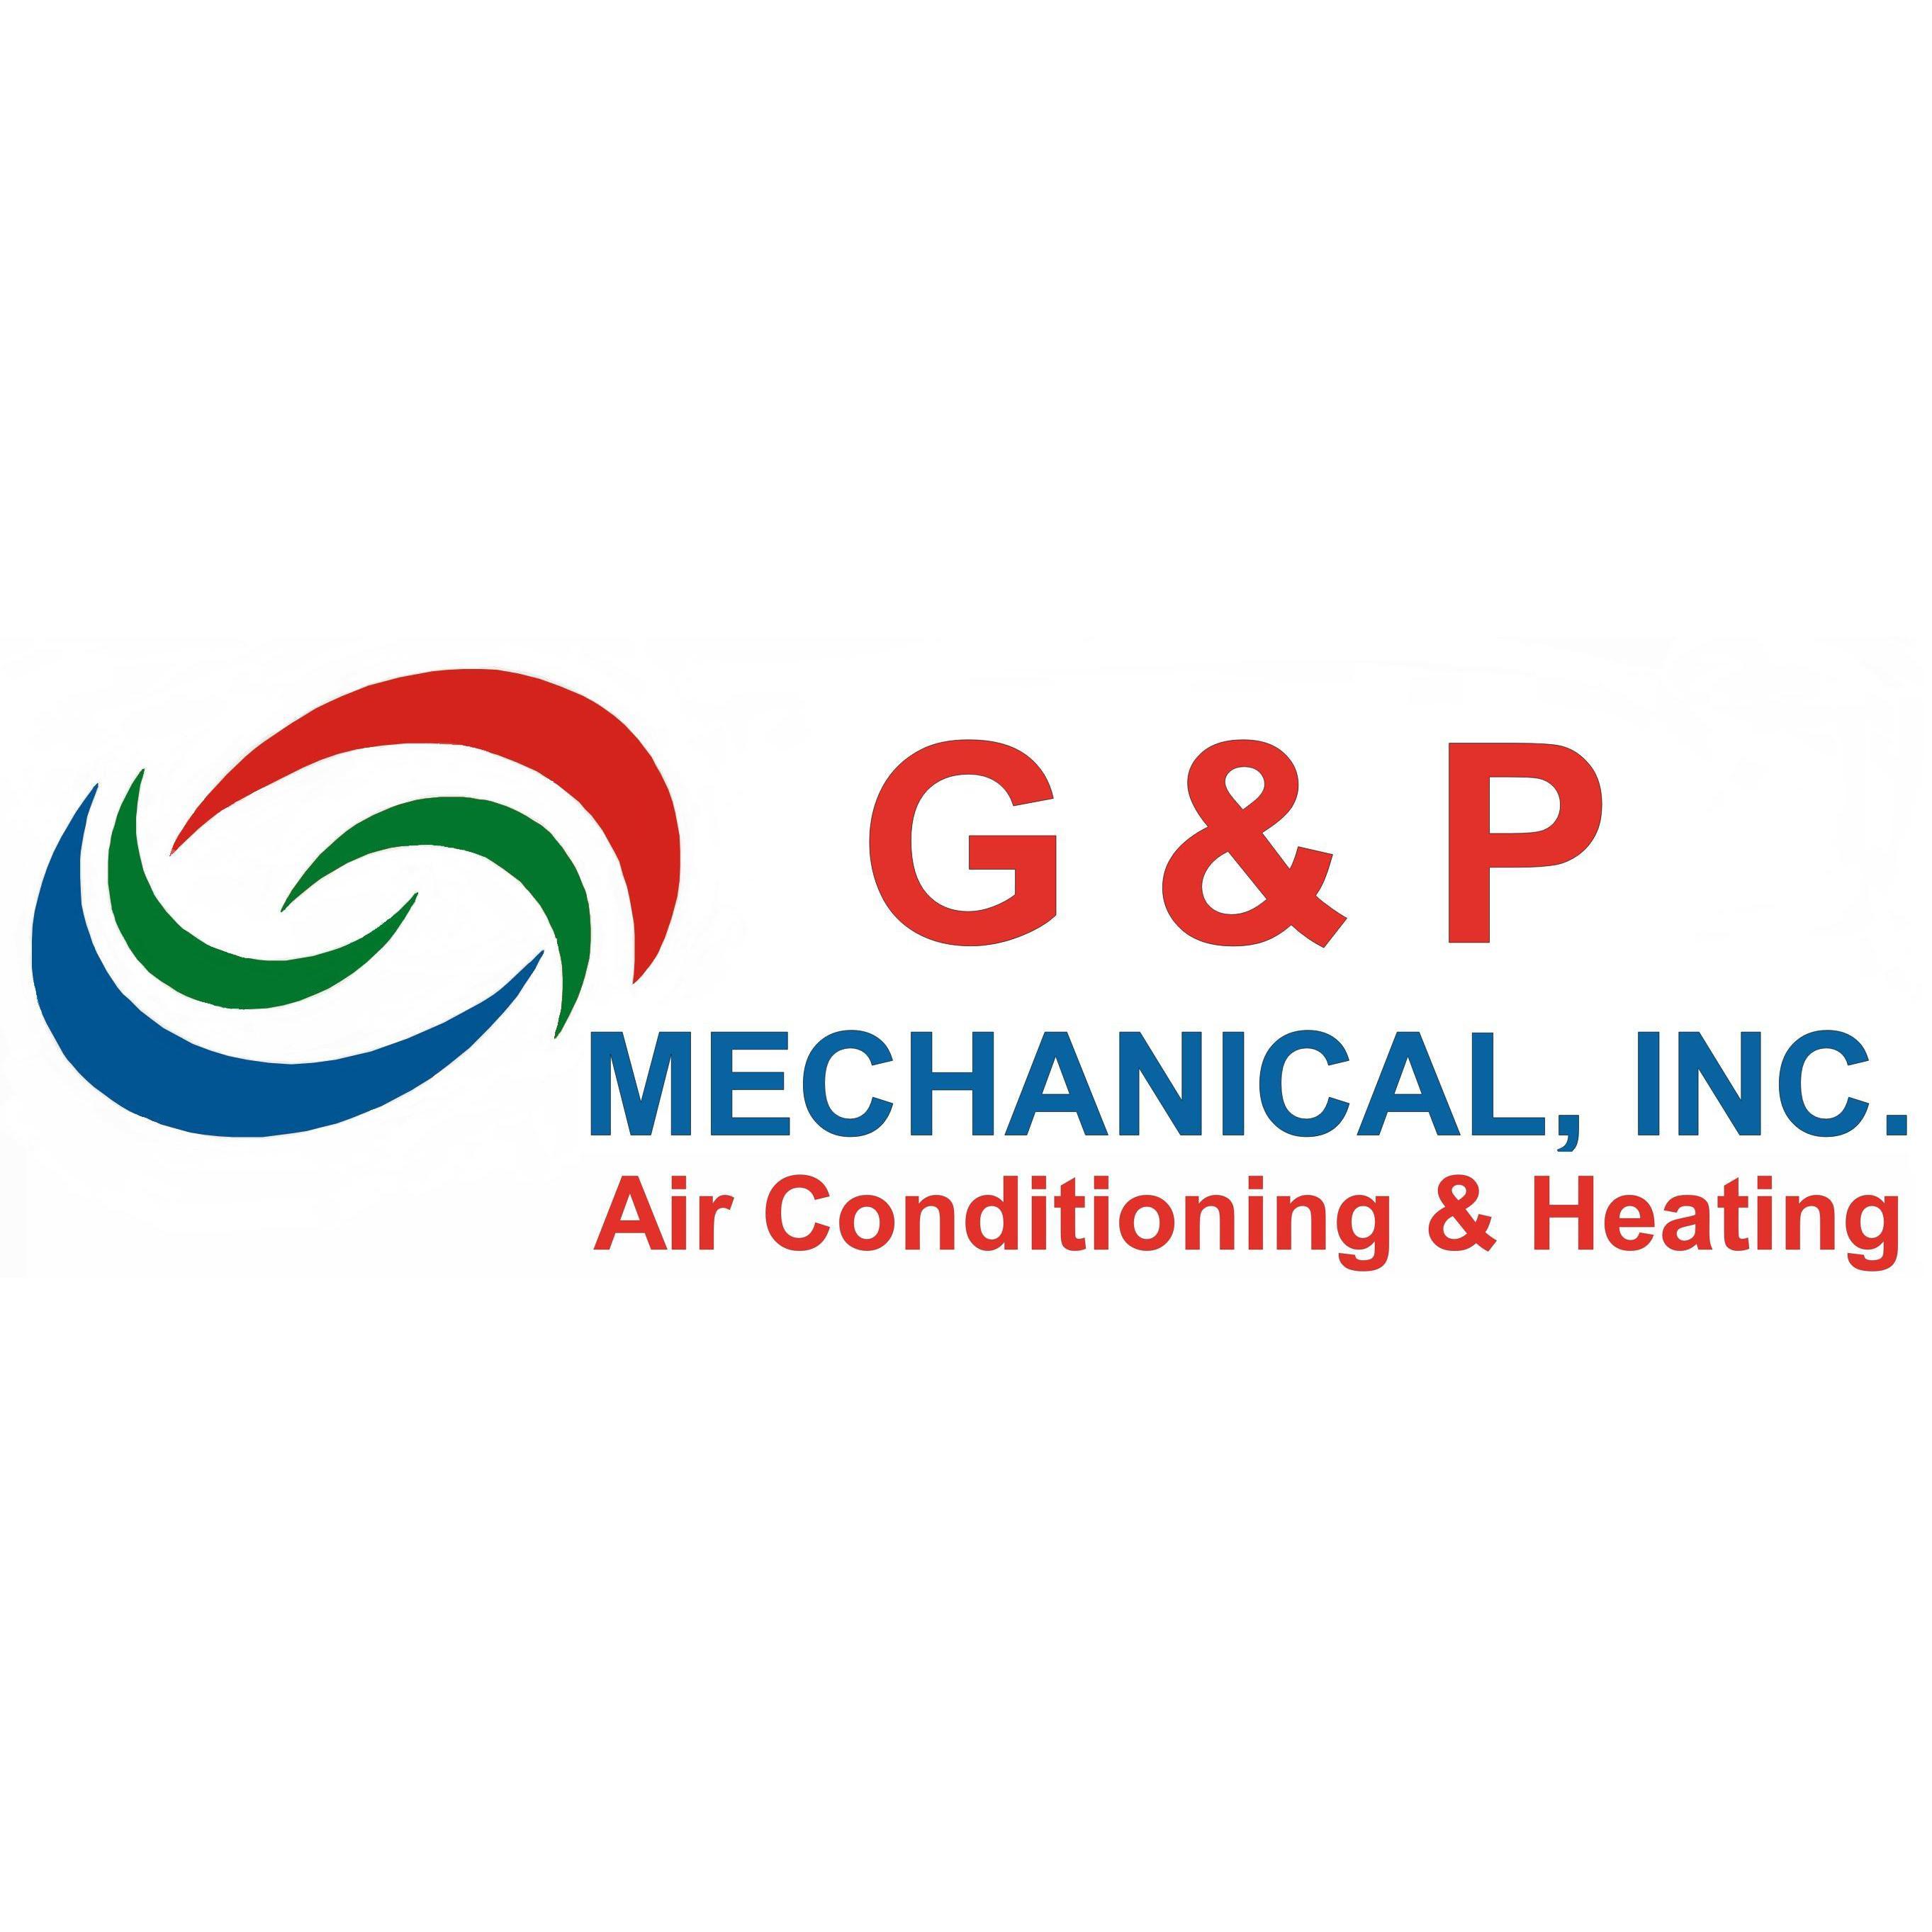 G & P Mechanical, Inc.